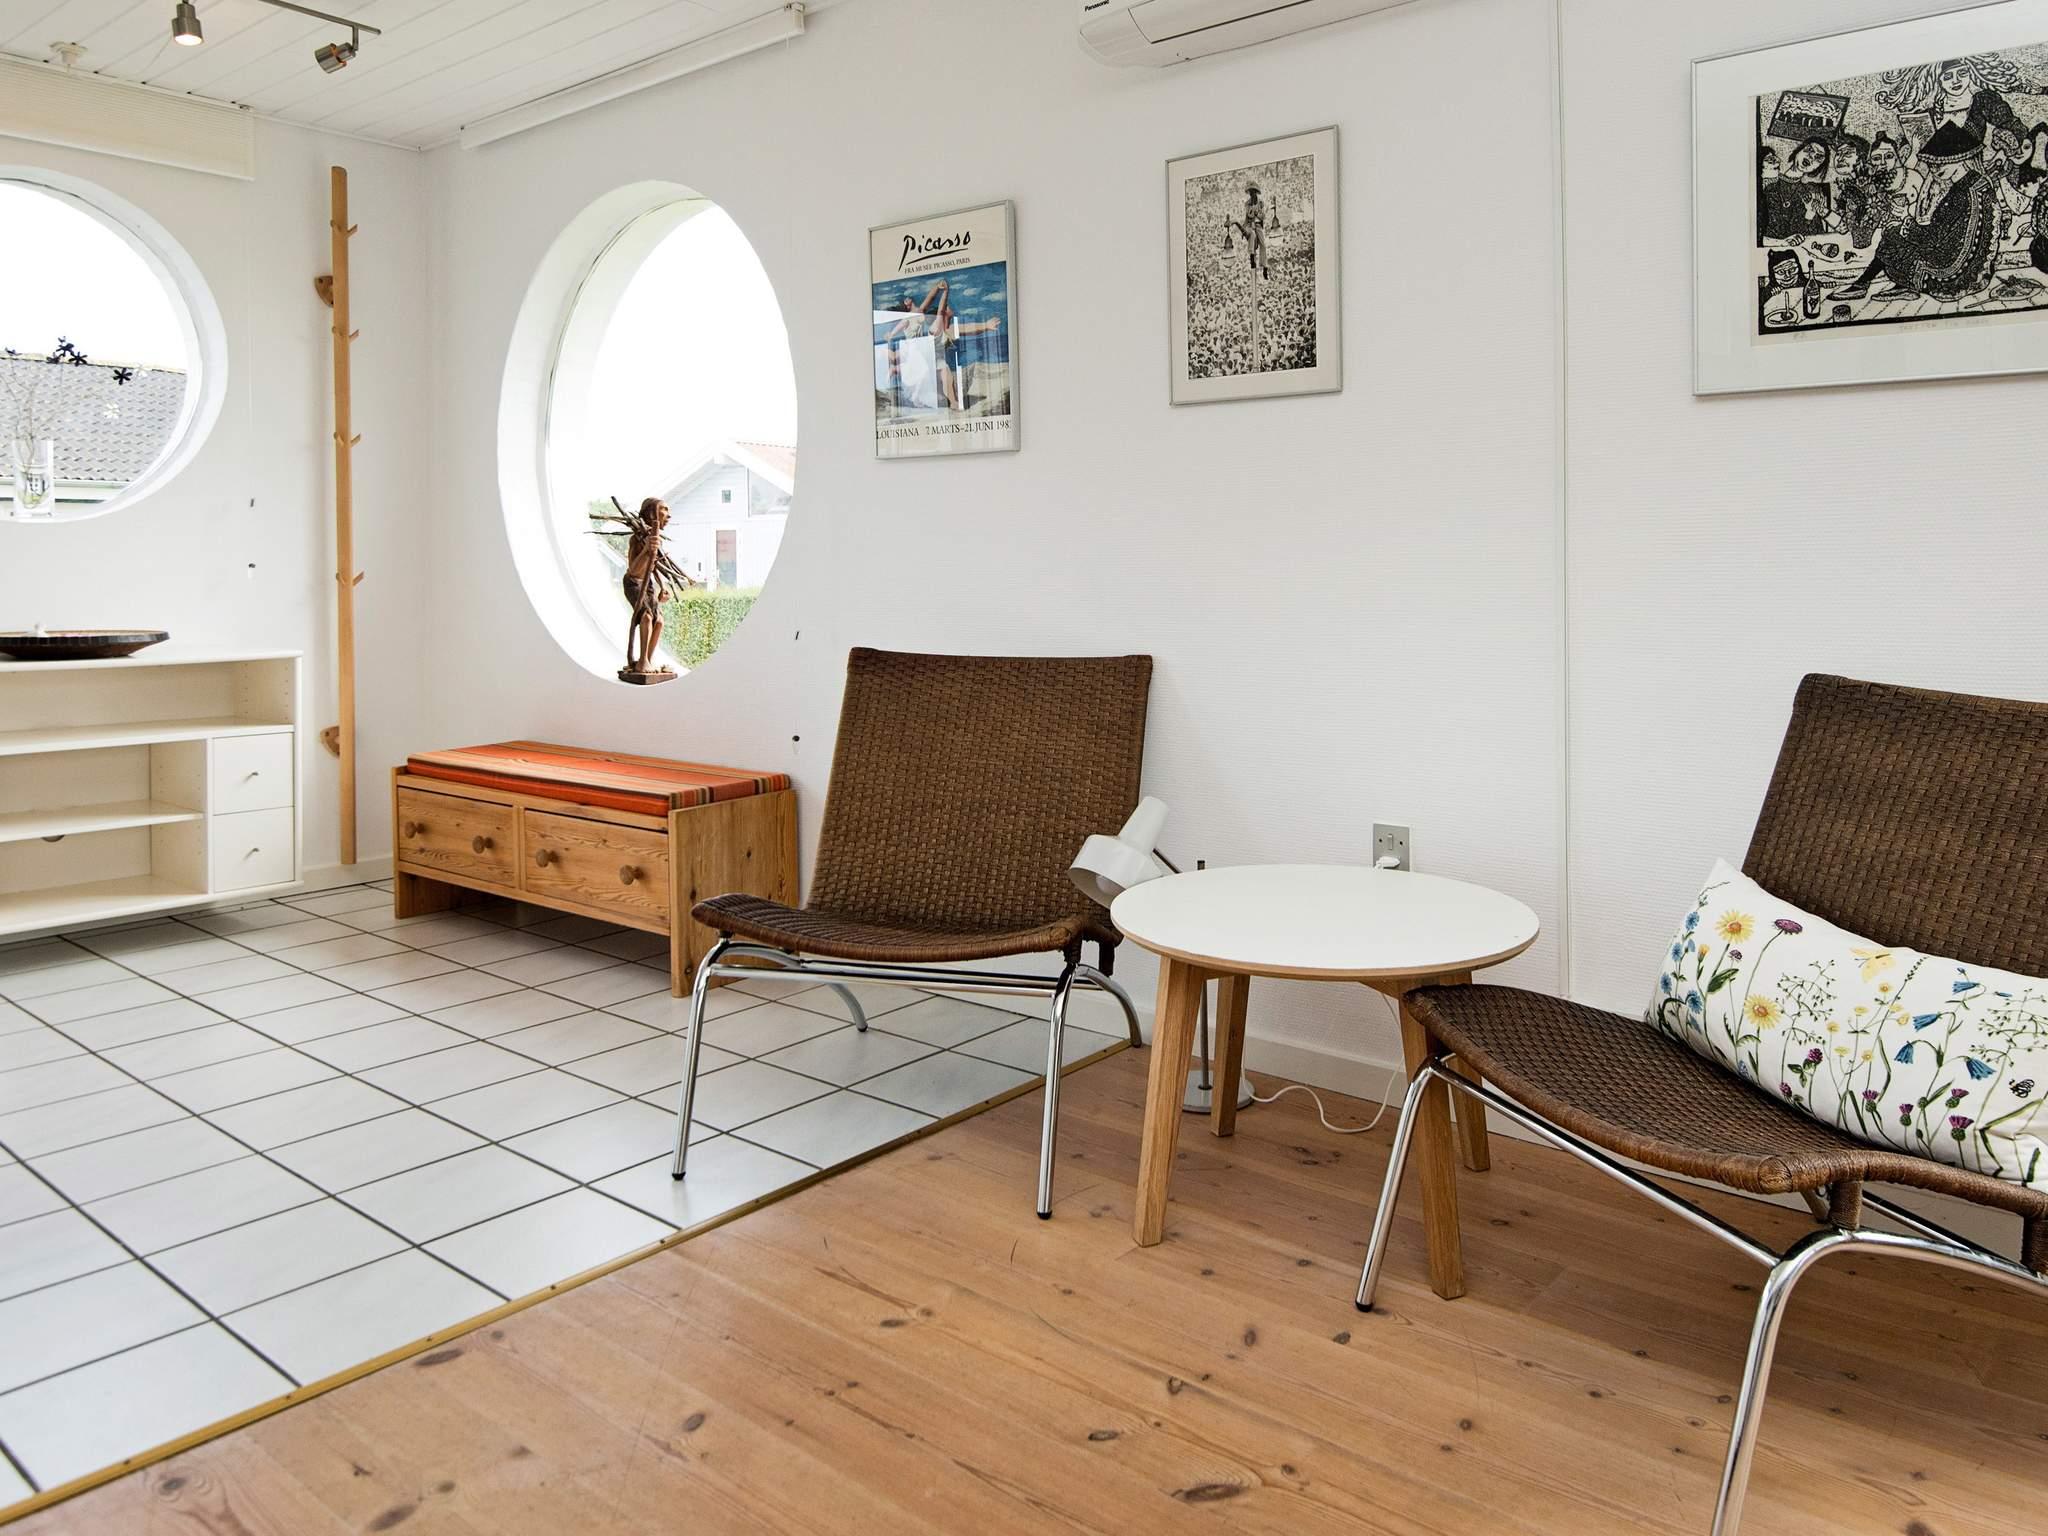 Ferienhaus Ajstrup Strand/Malling (2355032), Ajstrup, , Dänische Ostsee, Dänemark, Bild 6